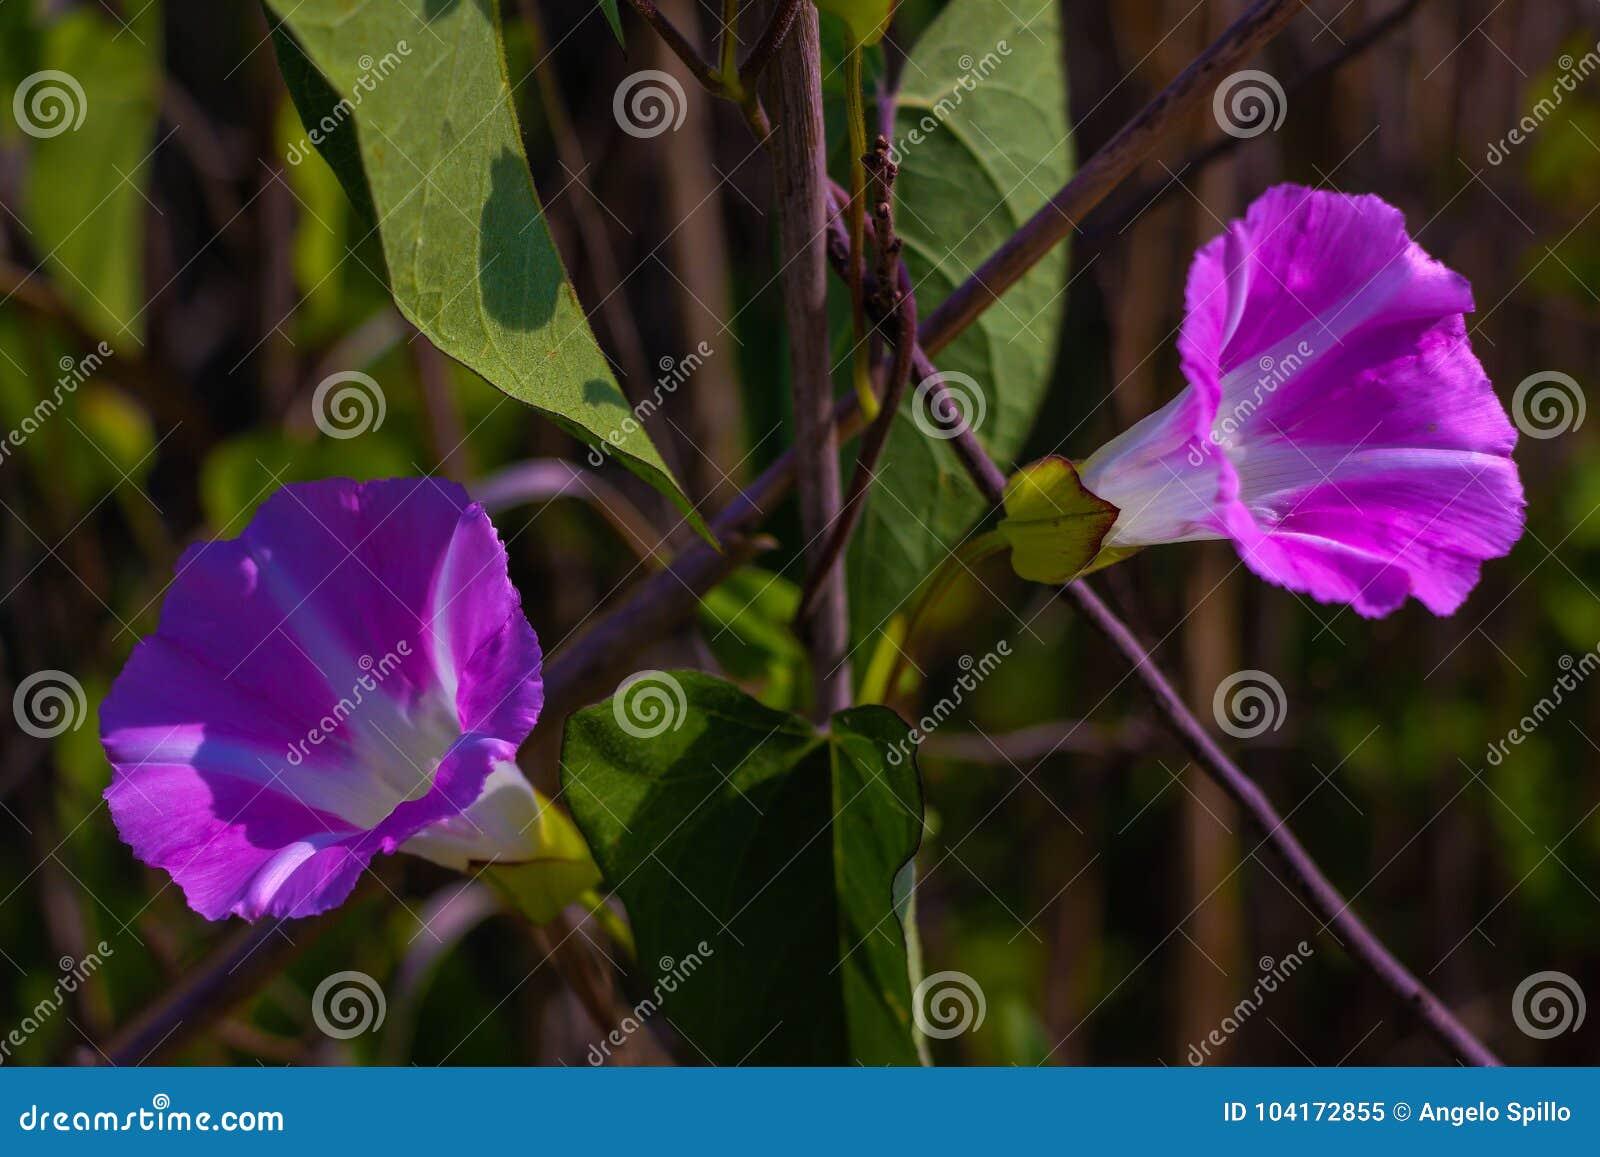 Corriola que floresce nas madeiras